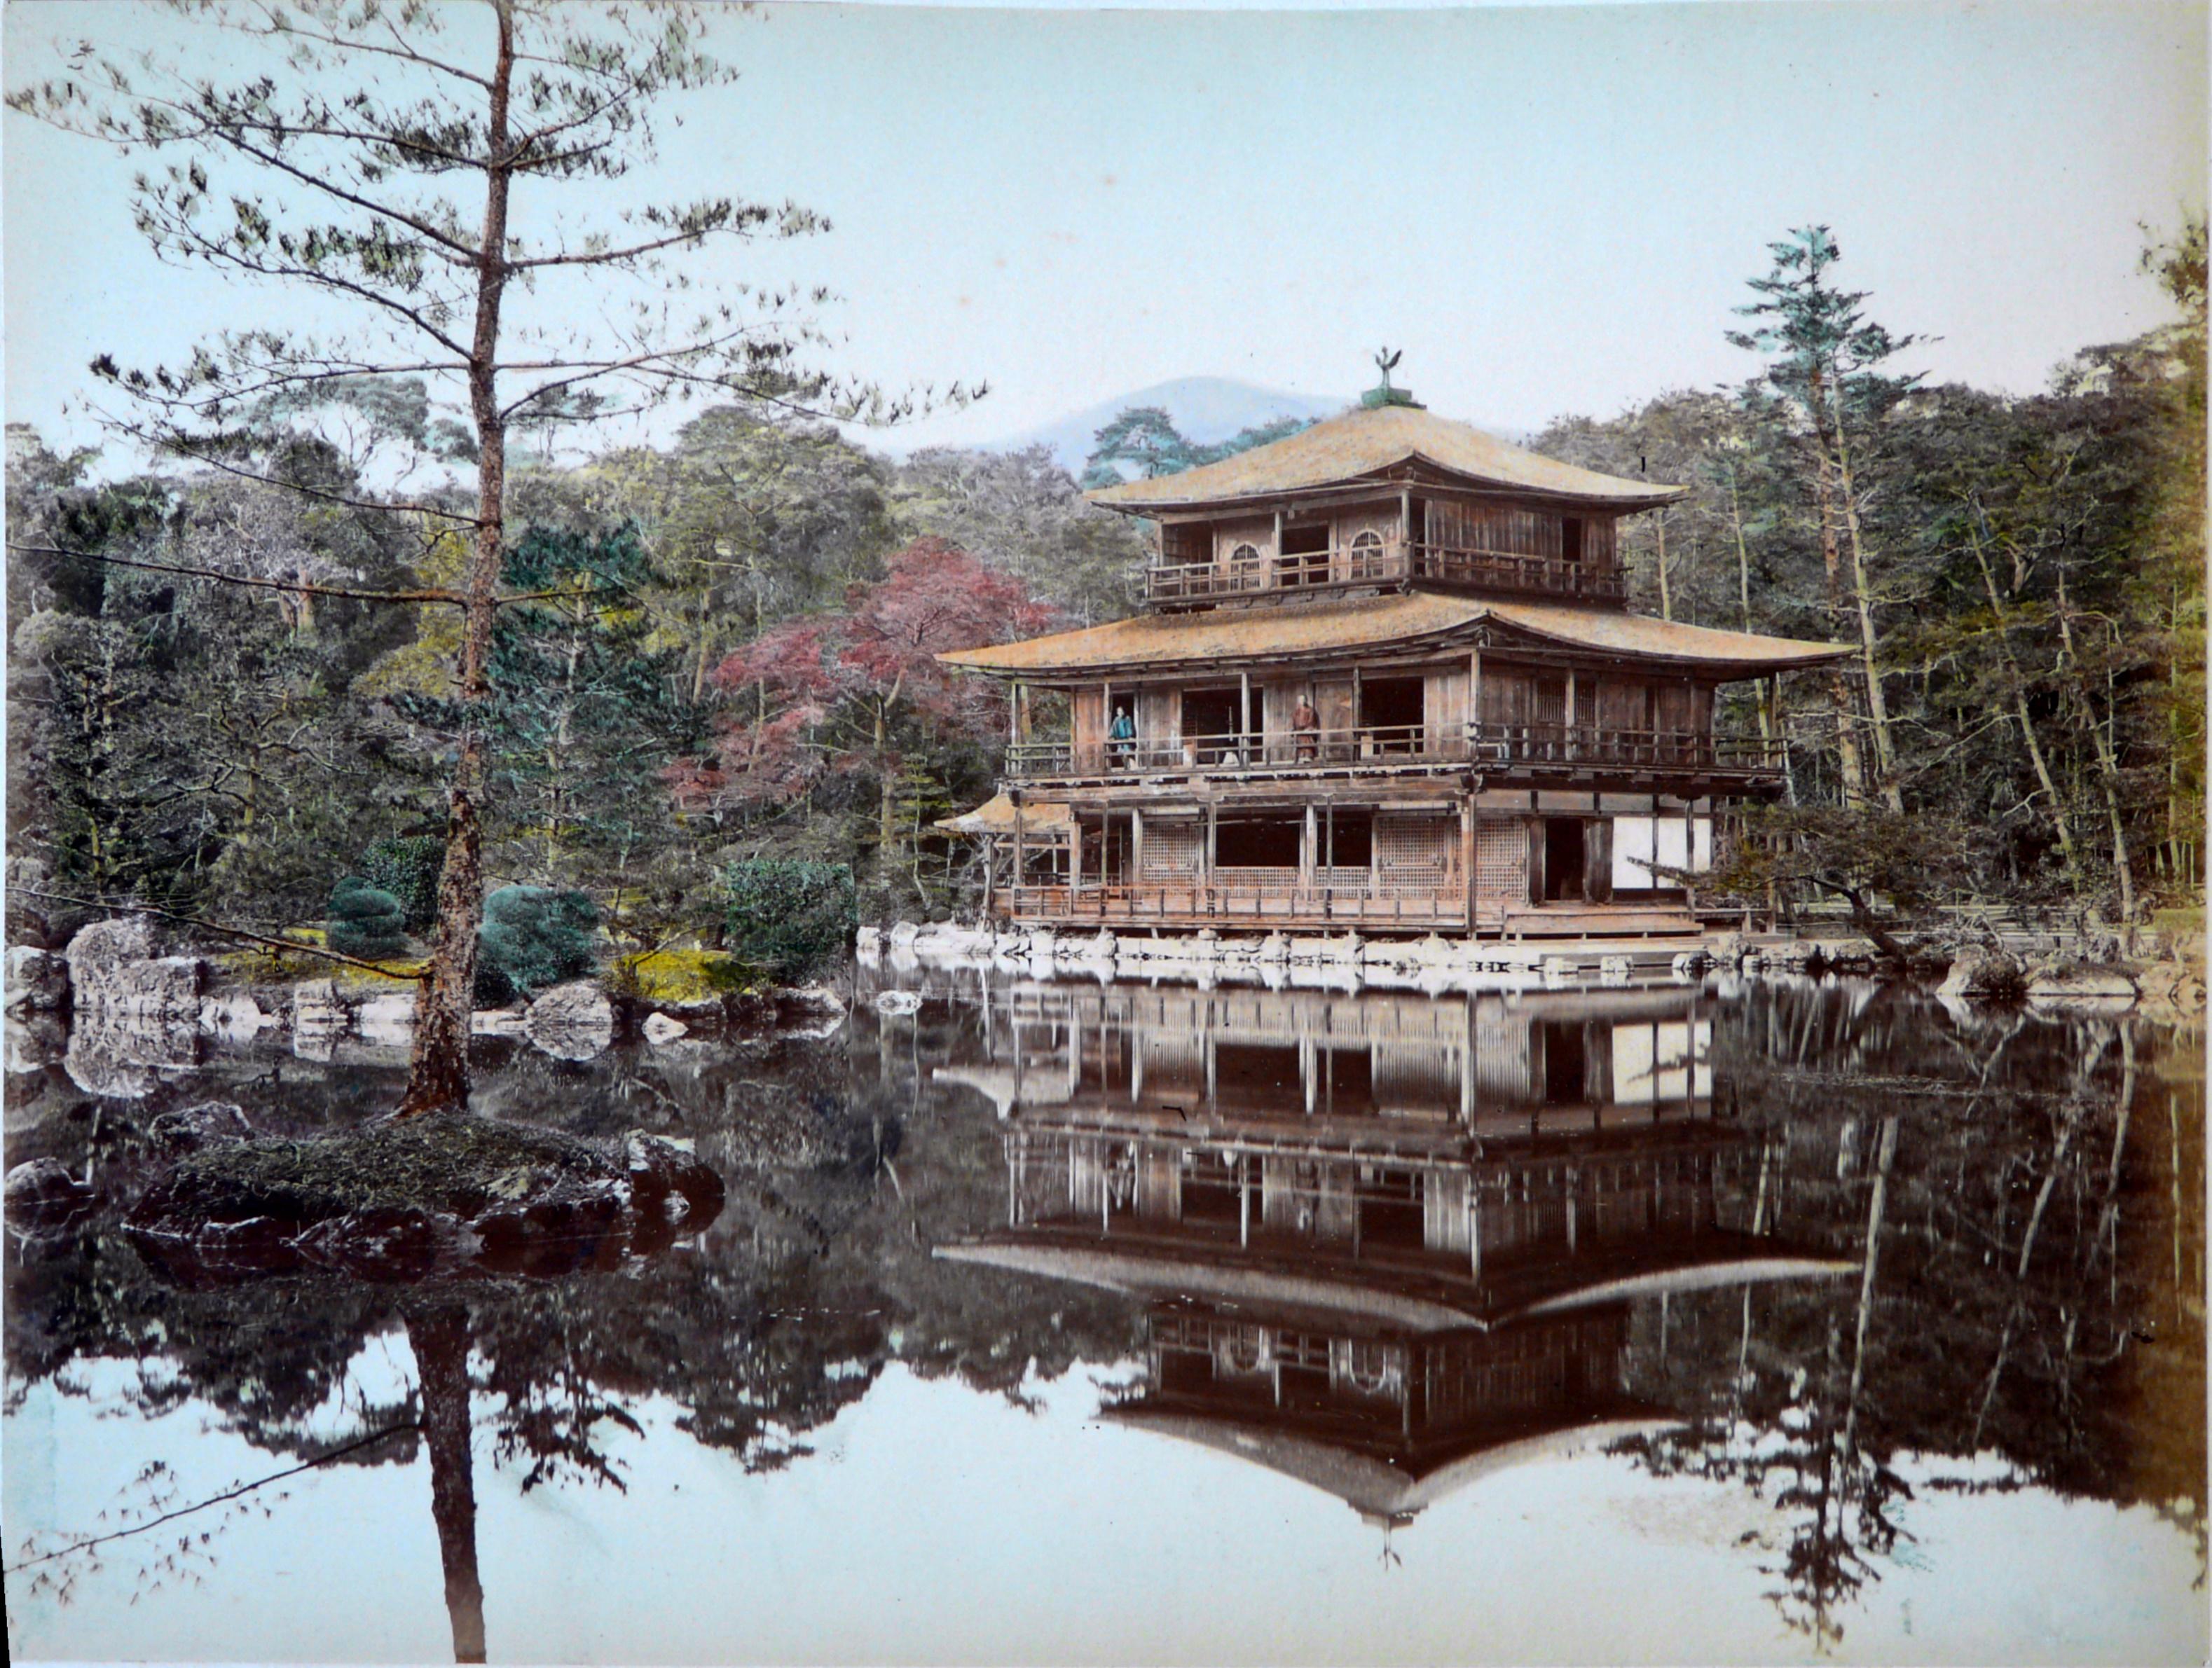 japon-la-quinta-de-jarama